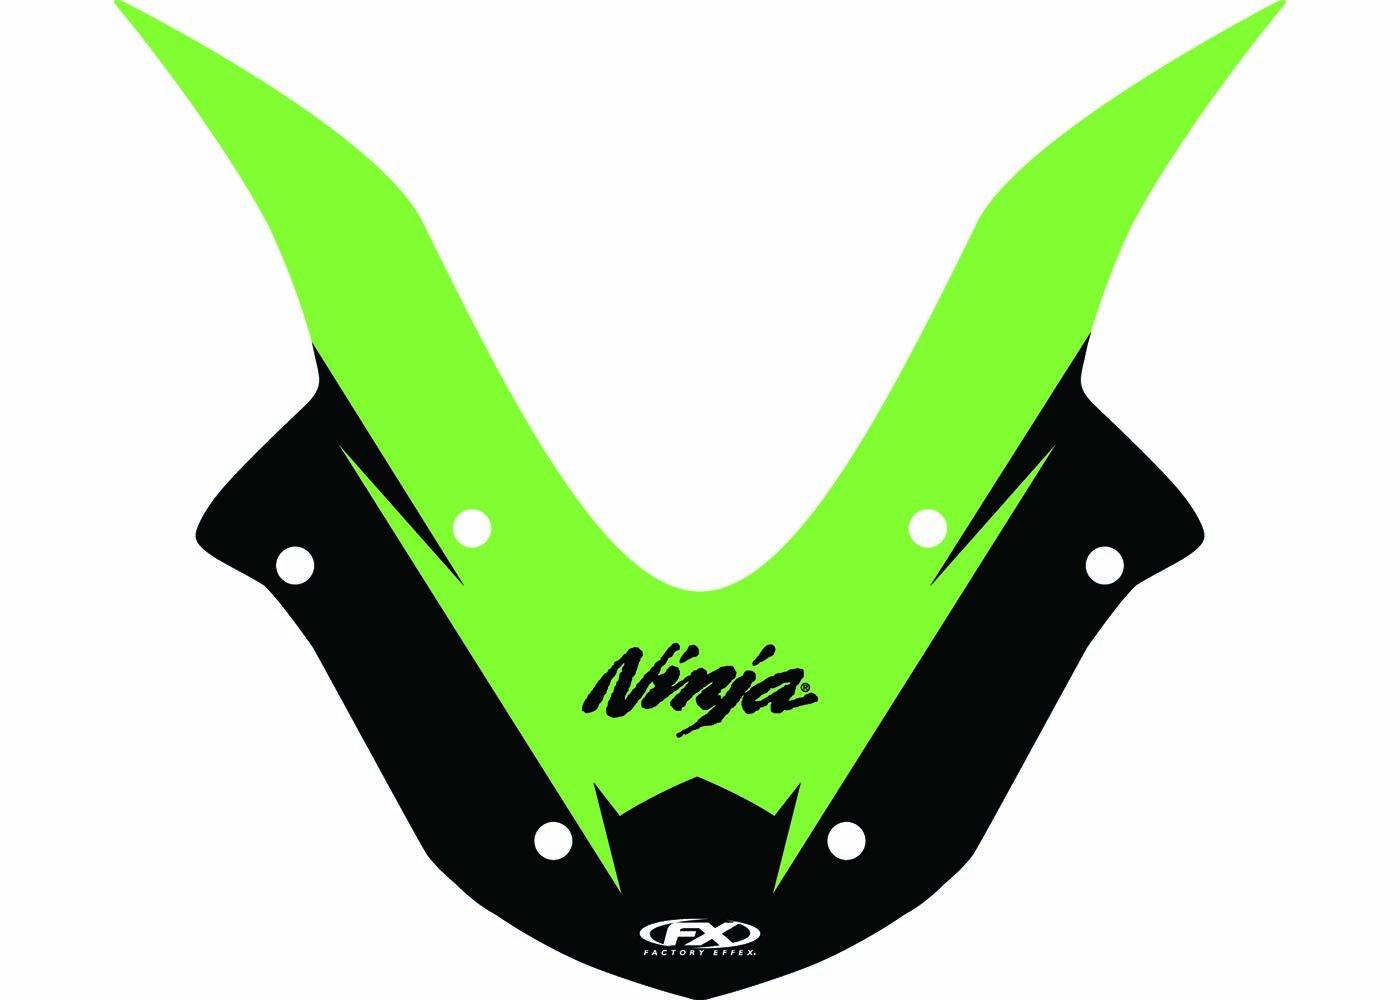 17-93124 EV-R Series Green Windscreen Graphic Kit Factory Effex